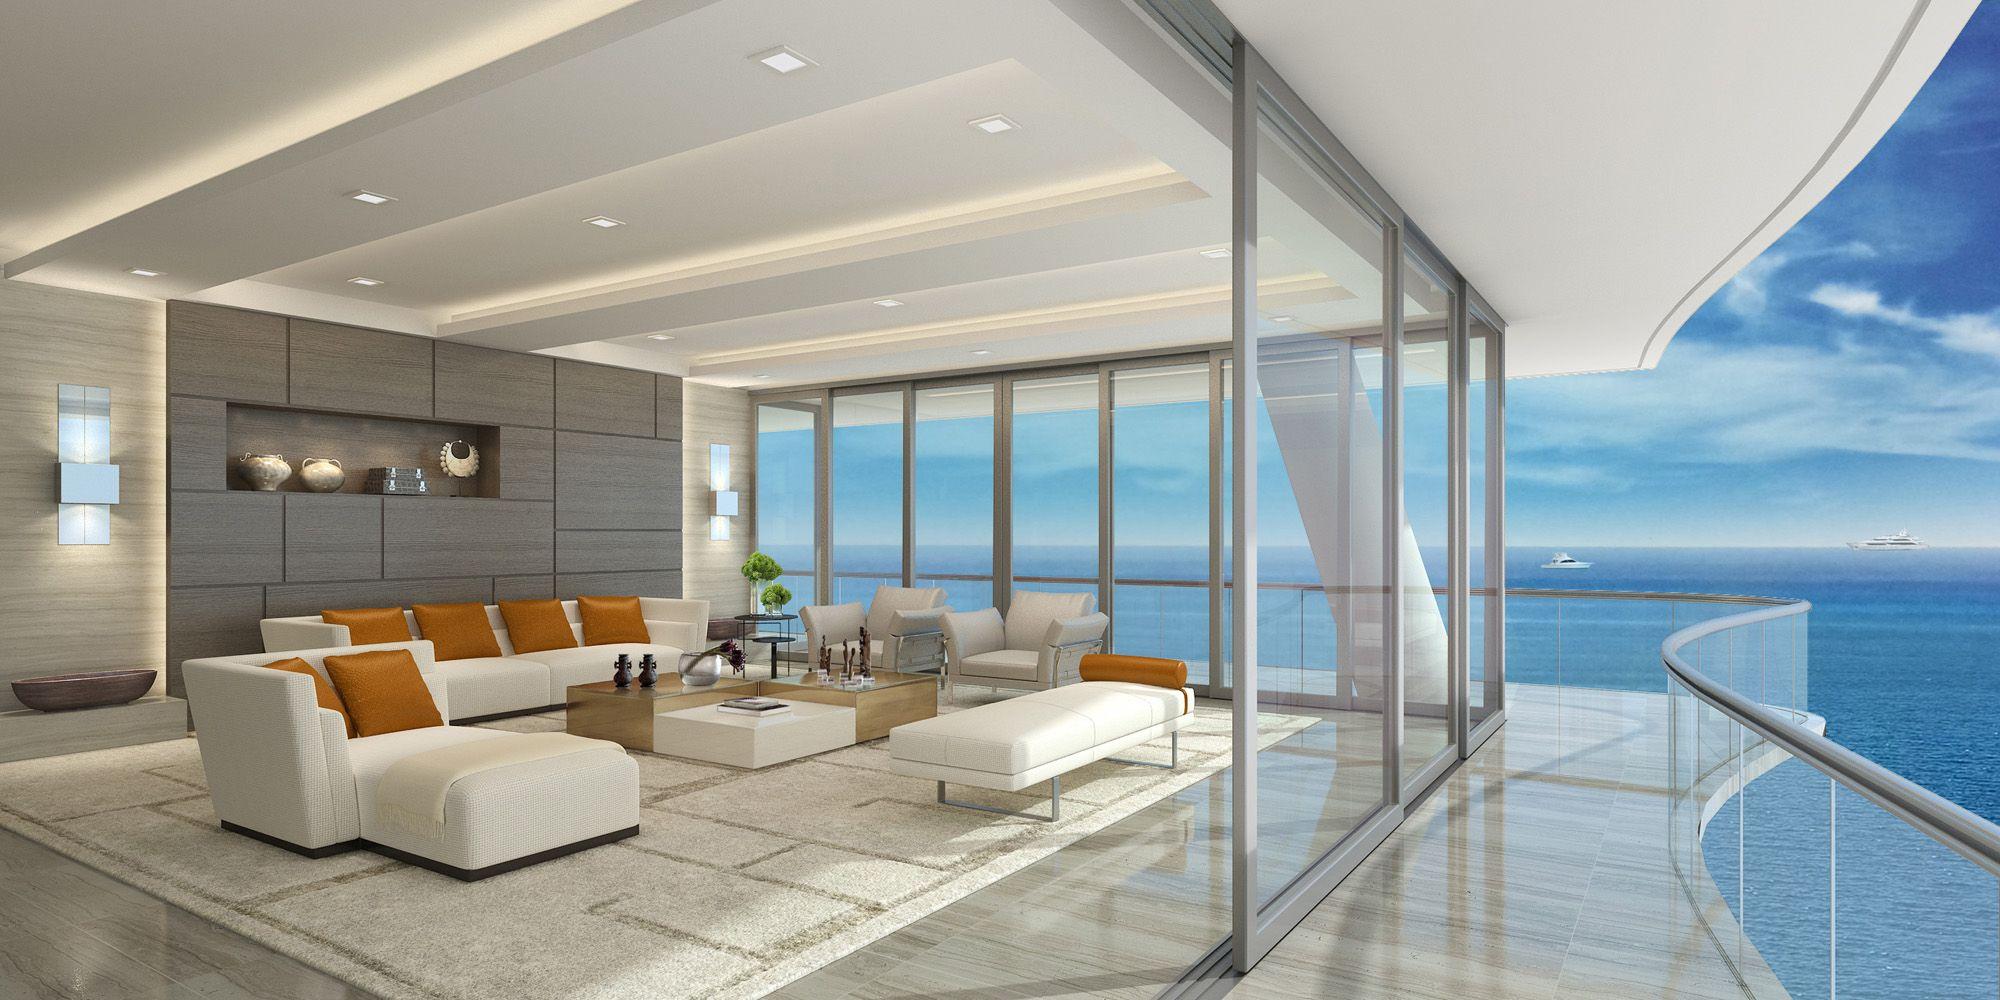 Fendi Chateau Residence Penthouse for Sale in Miami - Fendi Beach ...